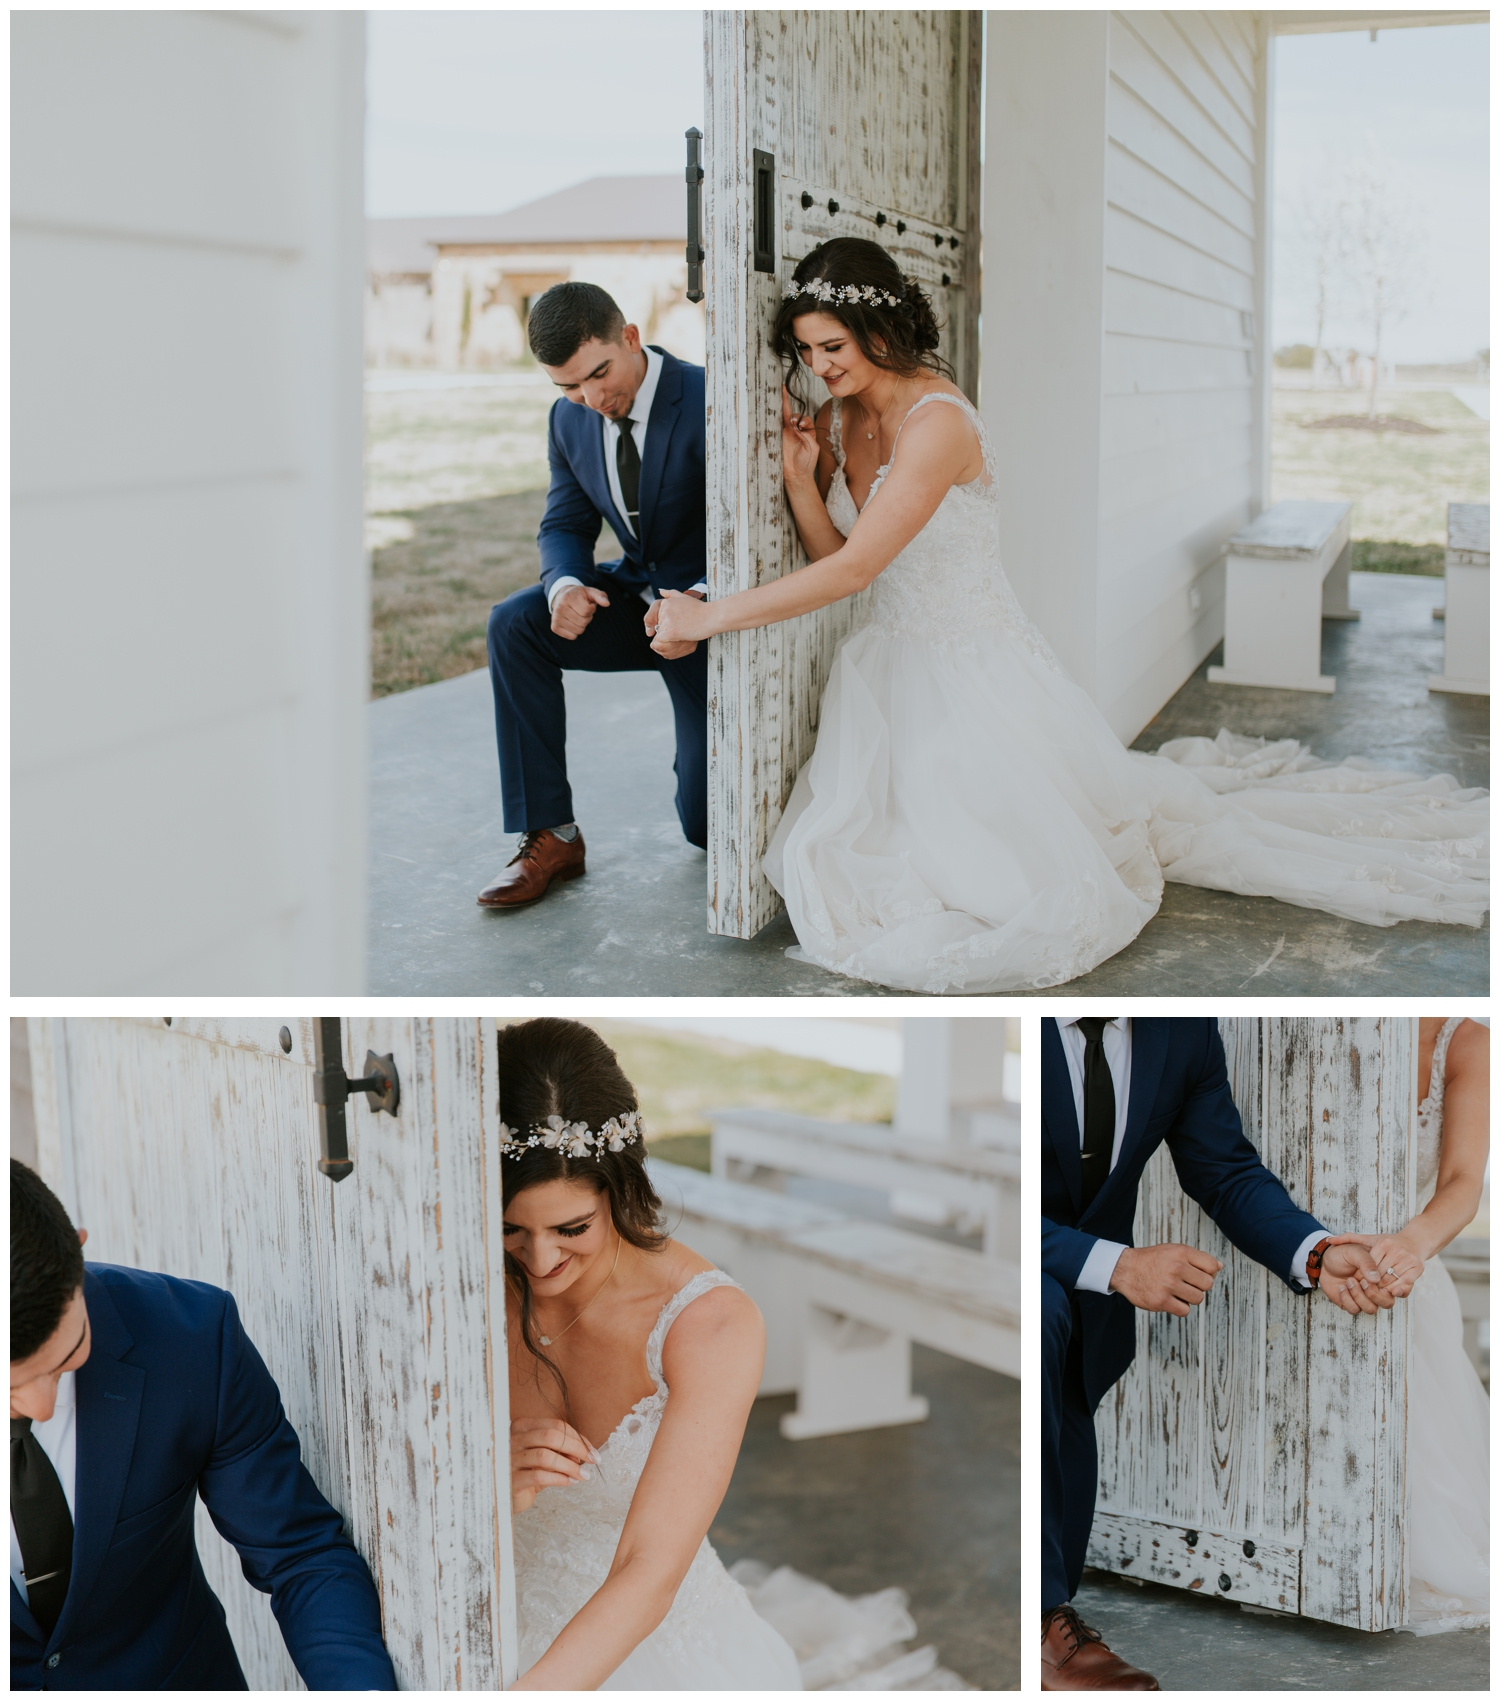 Ashlee+Mike, Featherstone Ranch Spring Wedding, San Antonio, Contista Productions Wedding Photography_0006.jpg